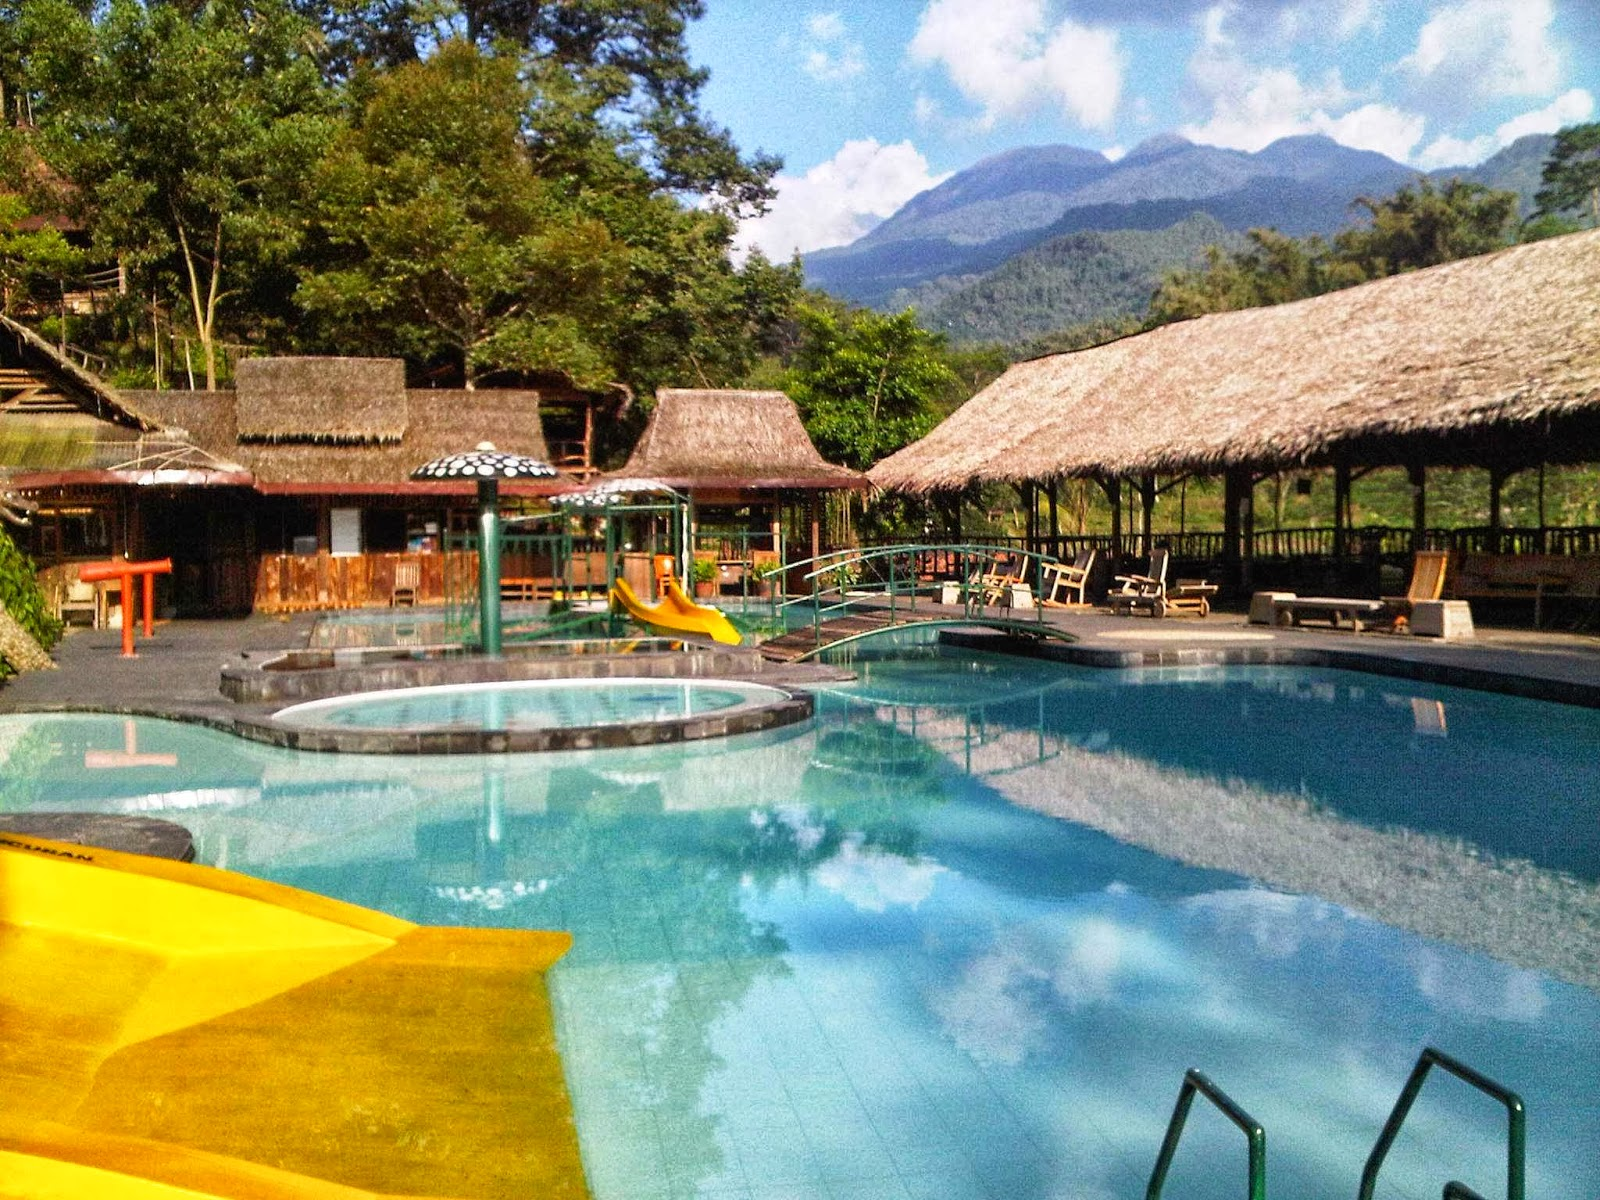 Kampoeng-djowo-sekatul-kolam-renang